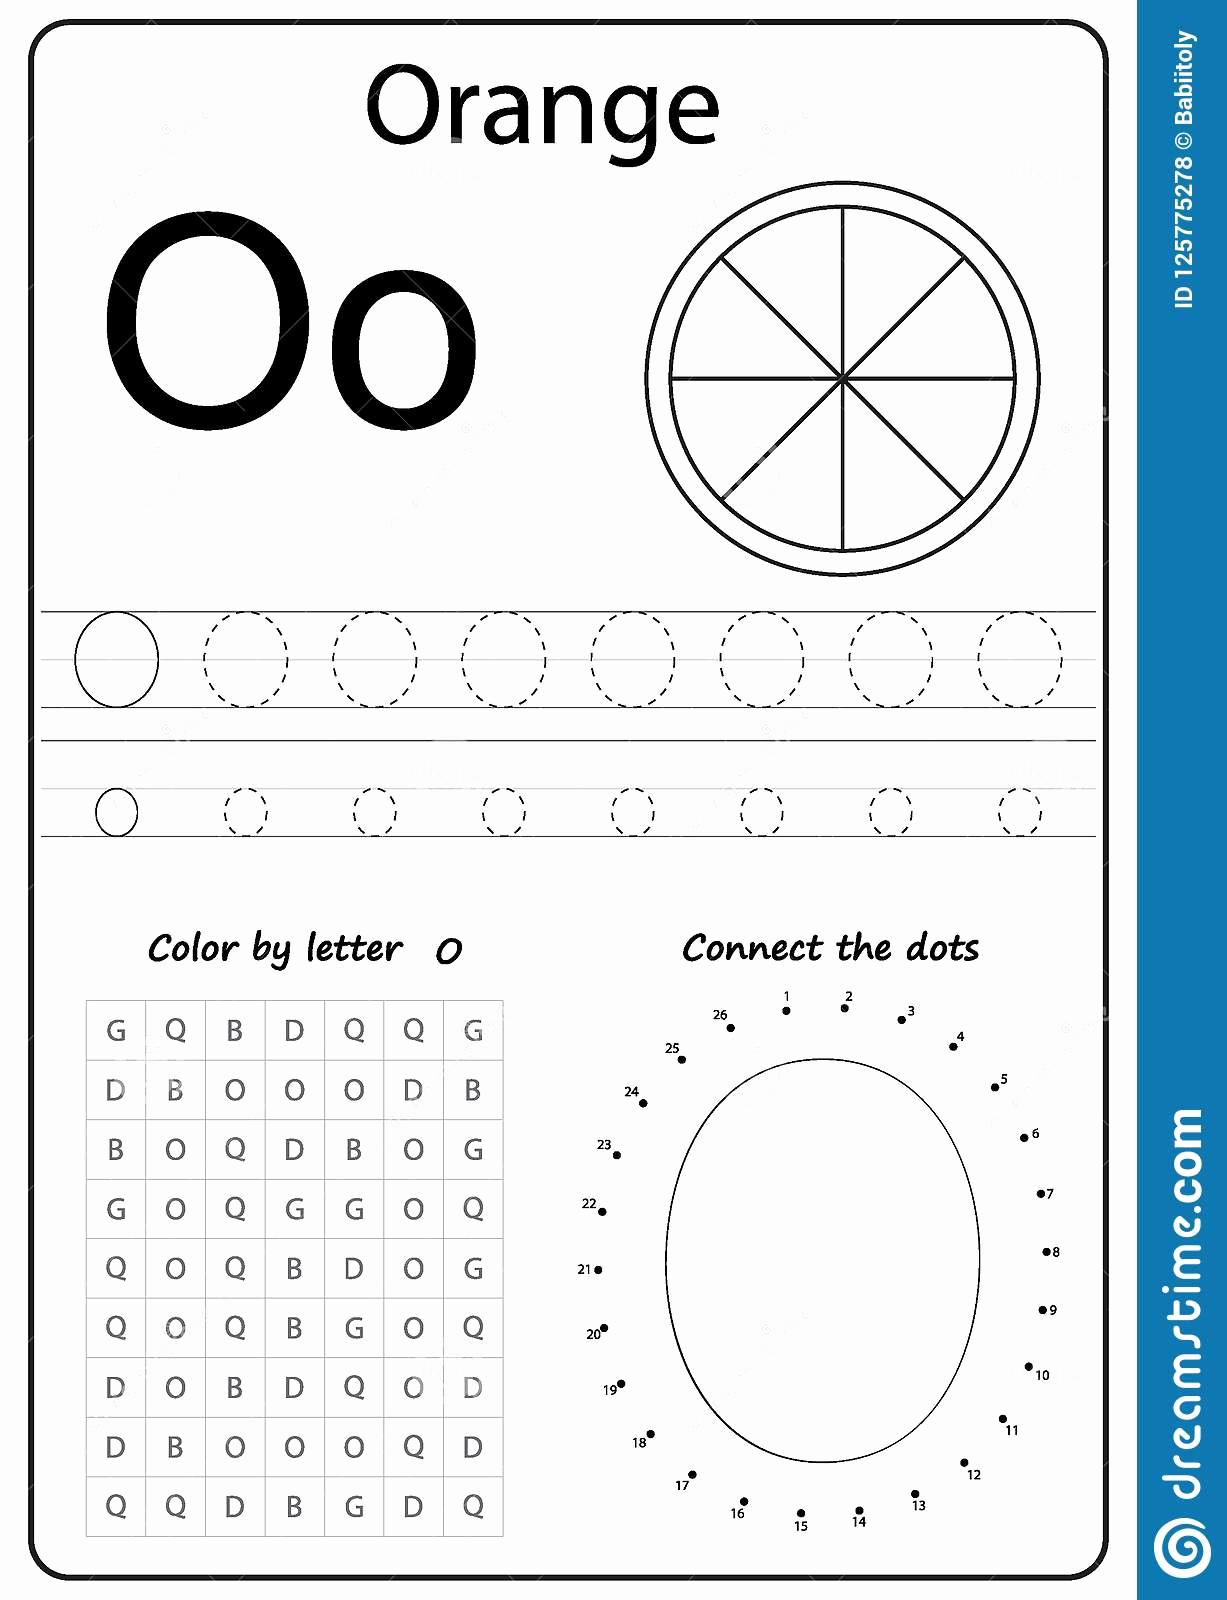 Letter O Worksheet for Kindergarten Best Of Preschool Letter O Worksheets for Kindergarten Preschool